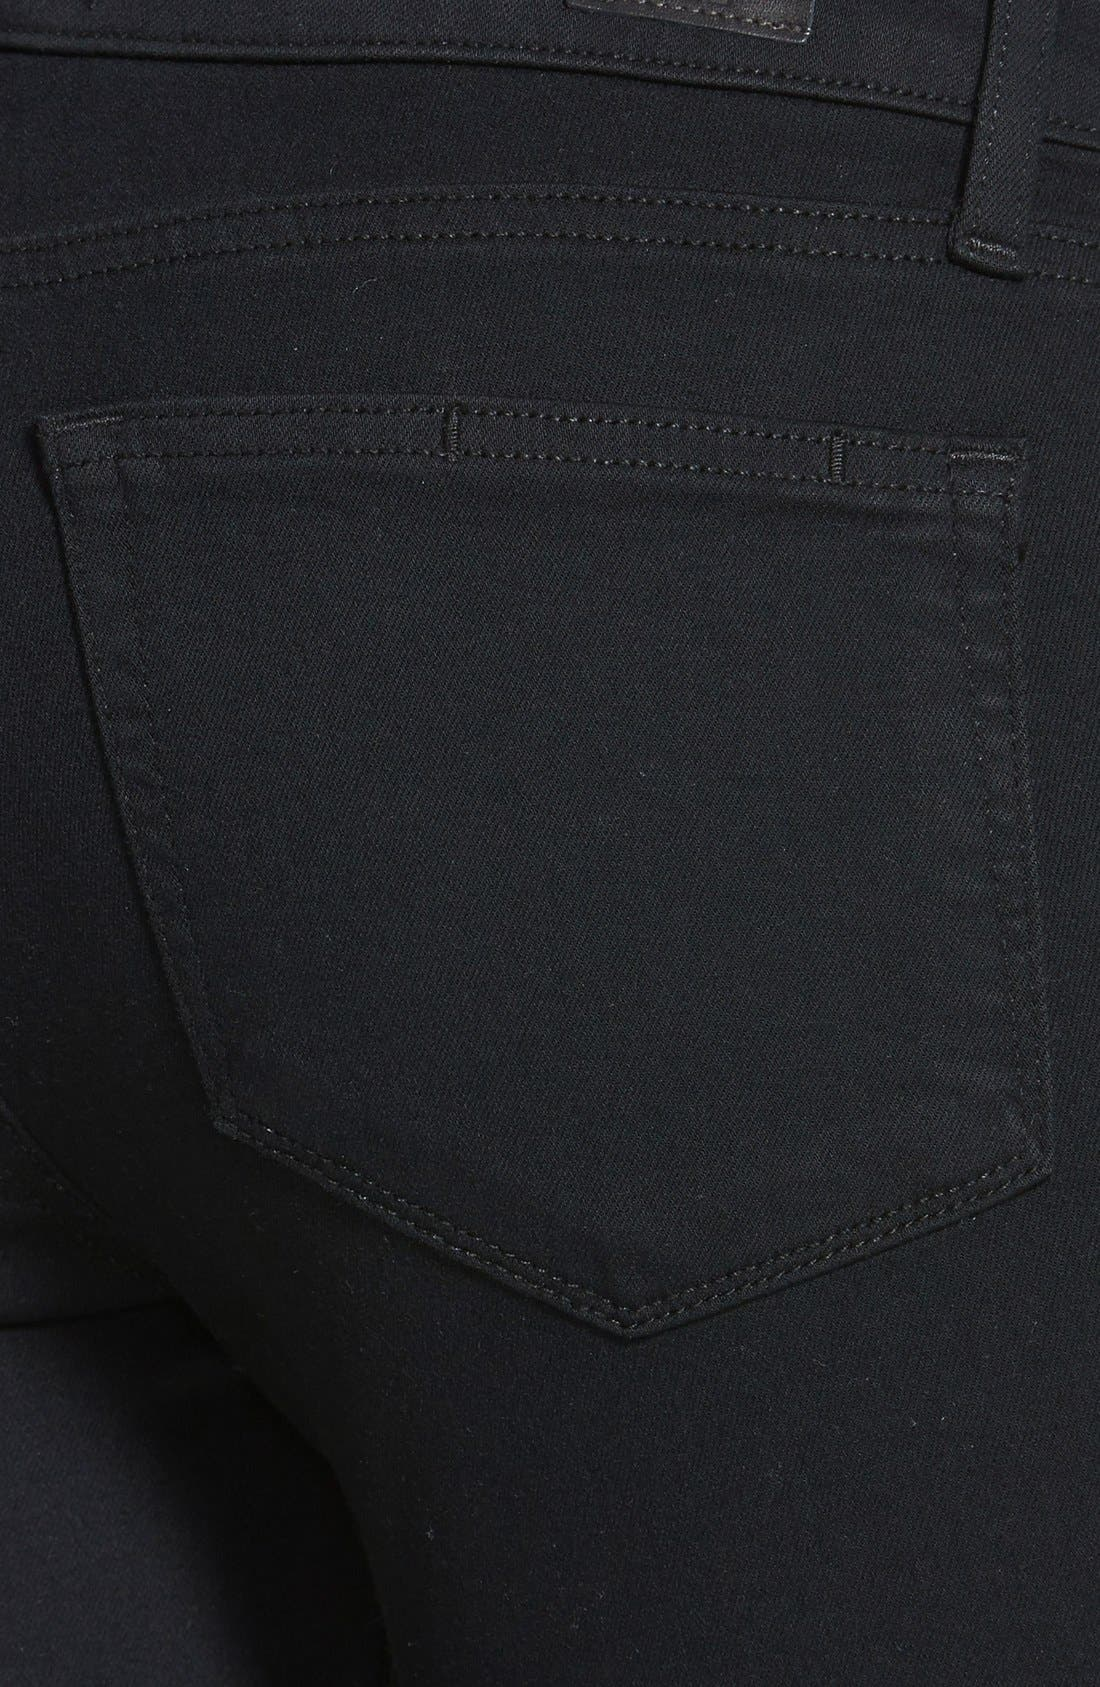 Transcend - Verdugo Ultra Skinny Jeans,                             Alternate thumbnail 3, color,                             Black Destructed